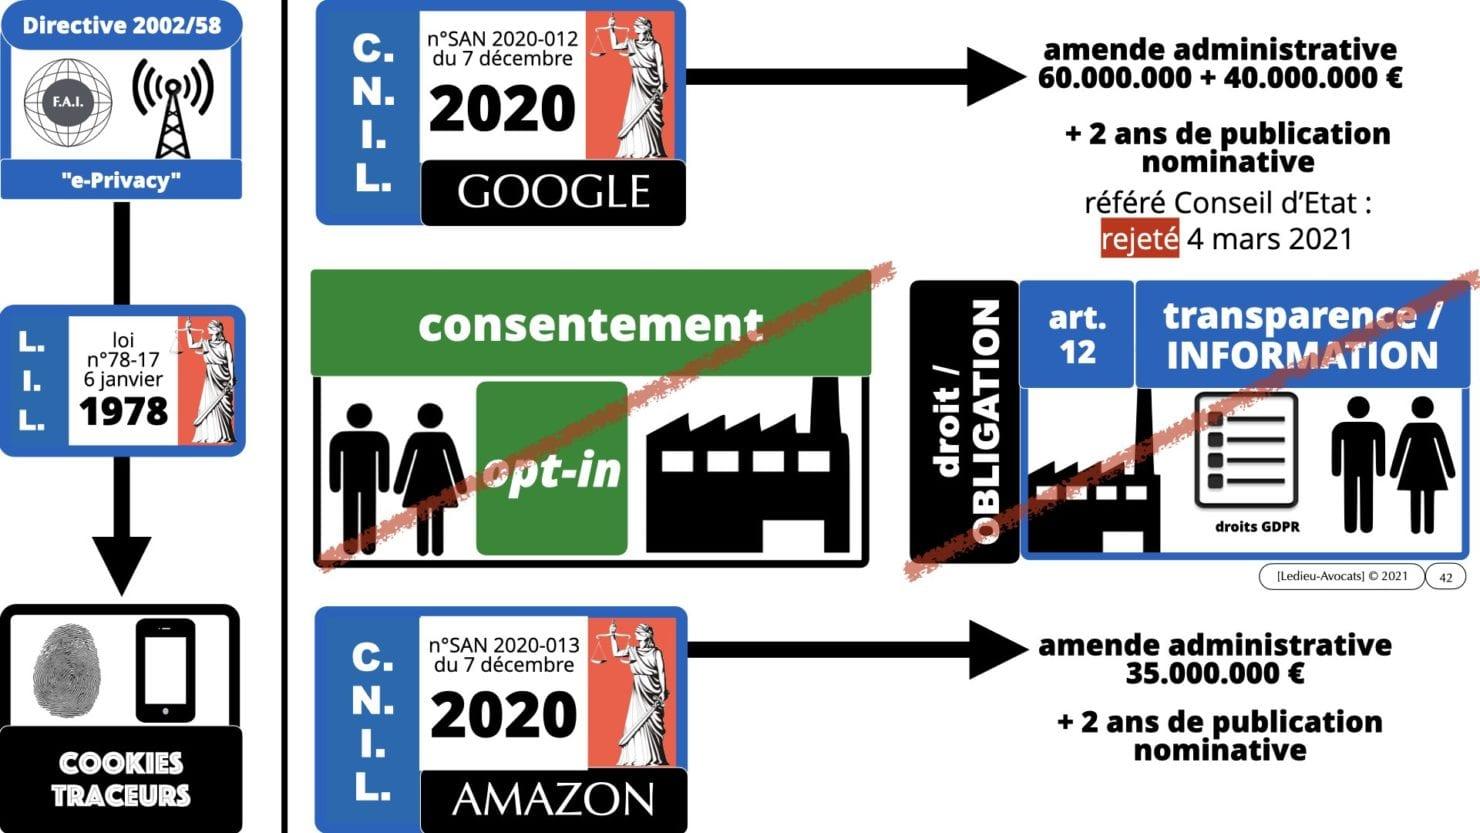 RGPD e-Privacy principes actualité jurisprudence ©Ledieu-Avocats 25-06-2021.042